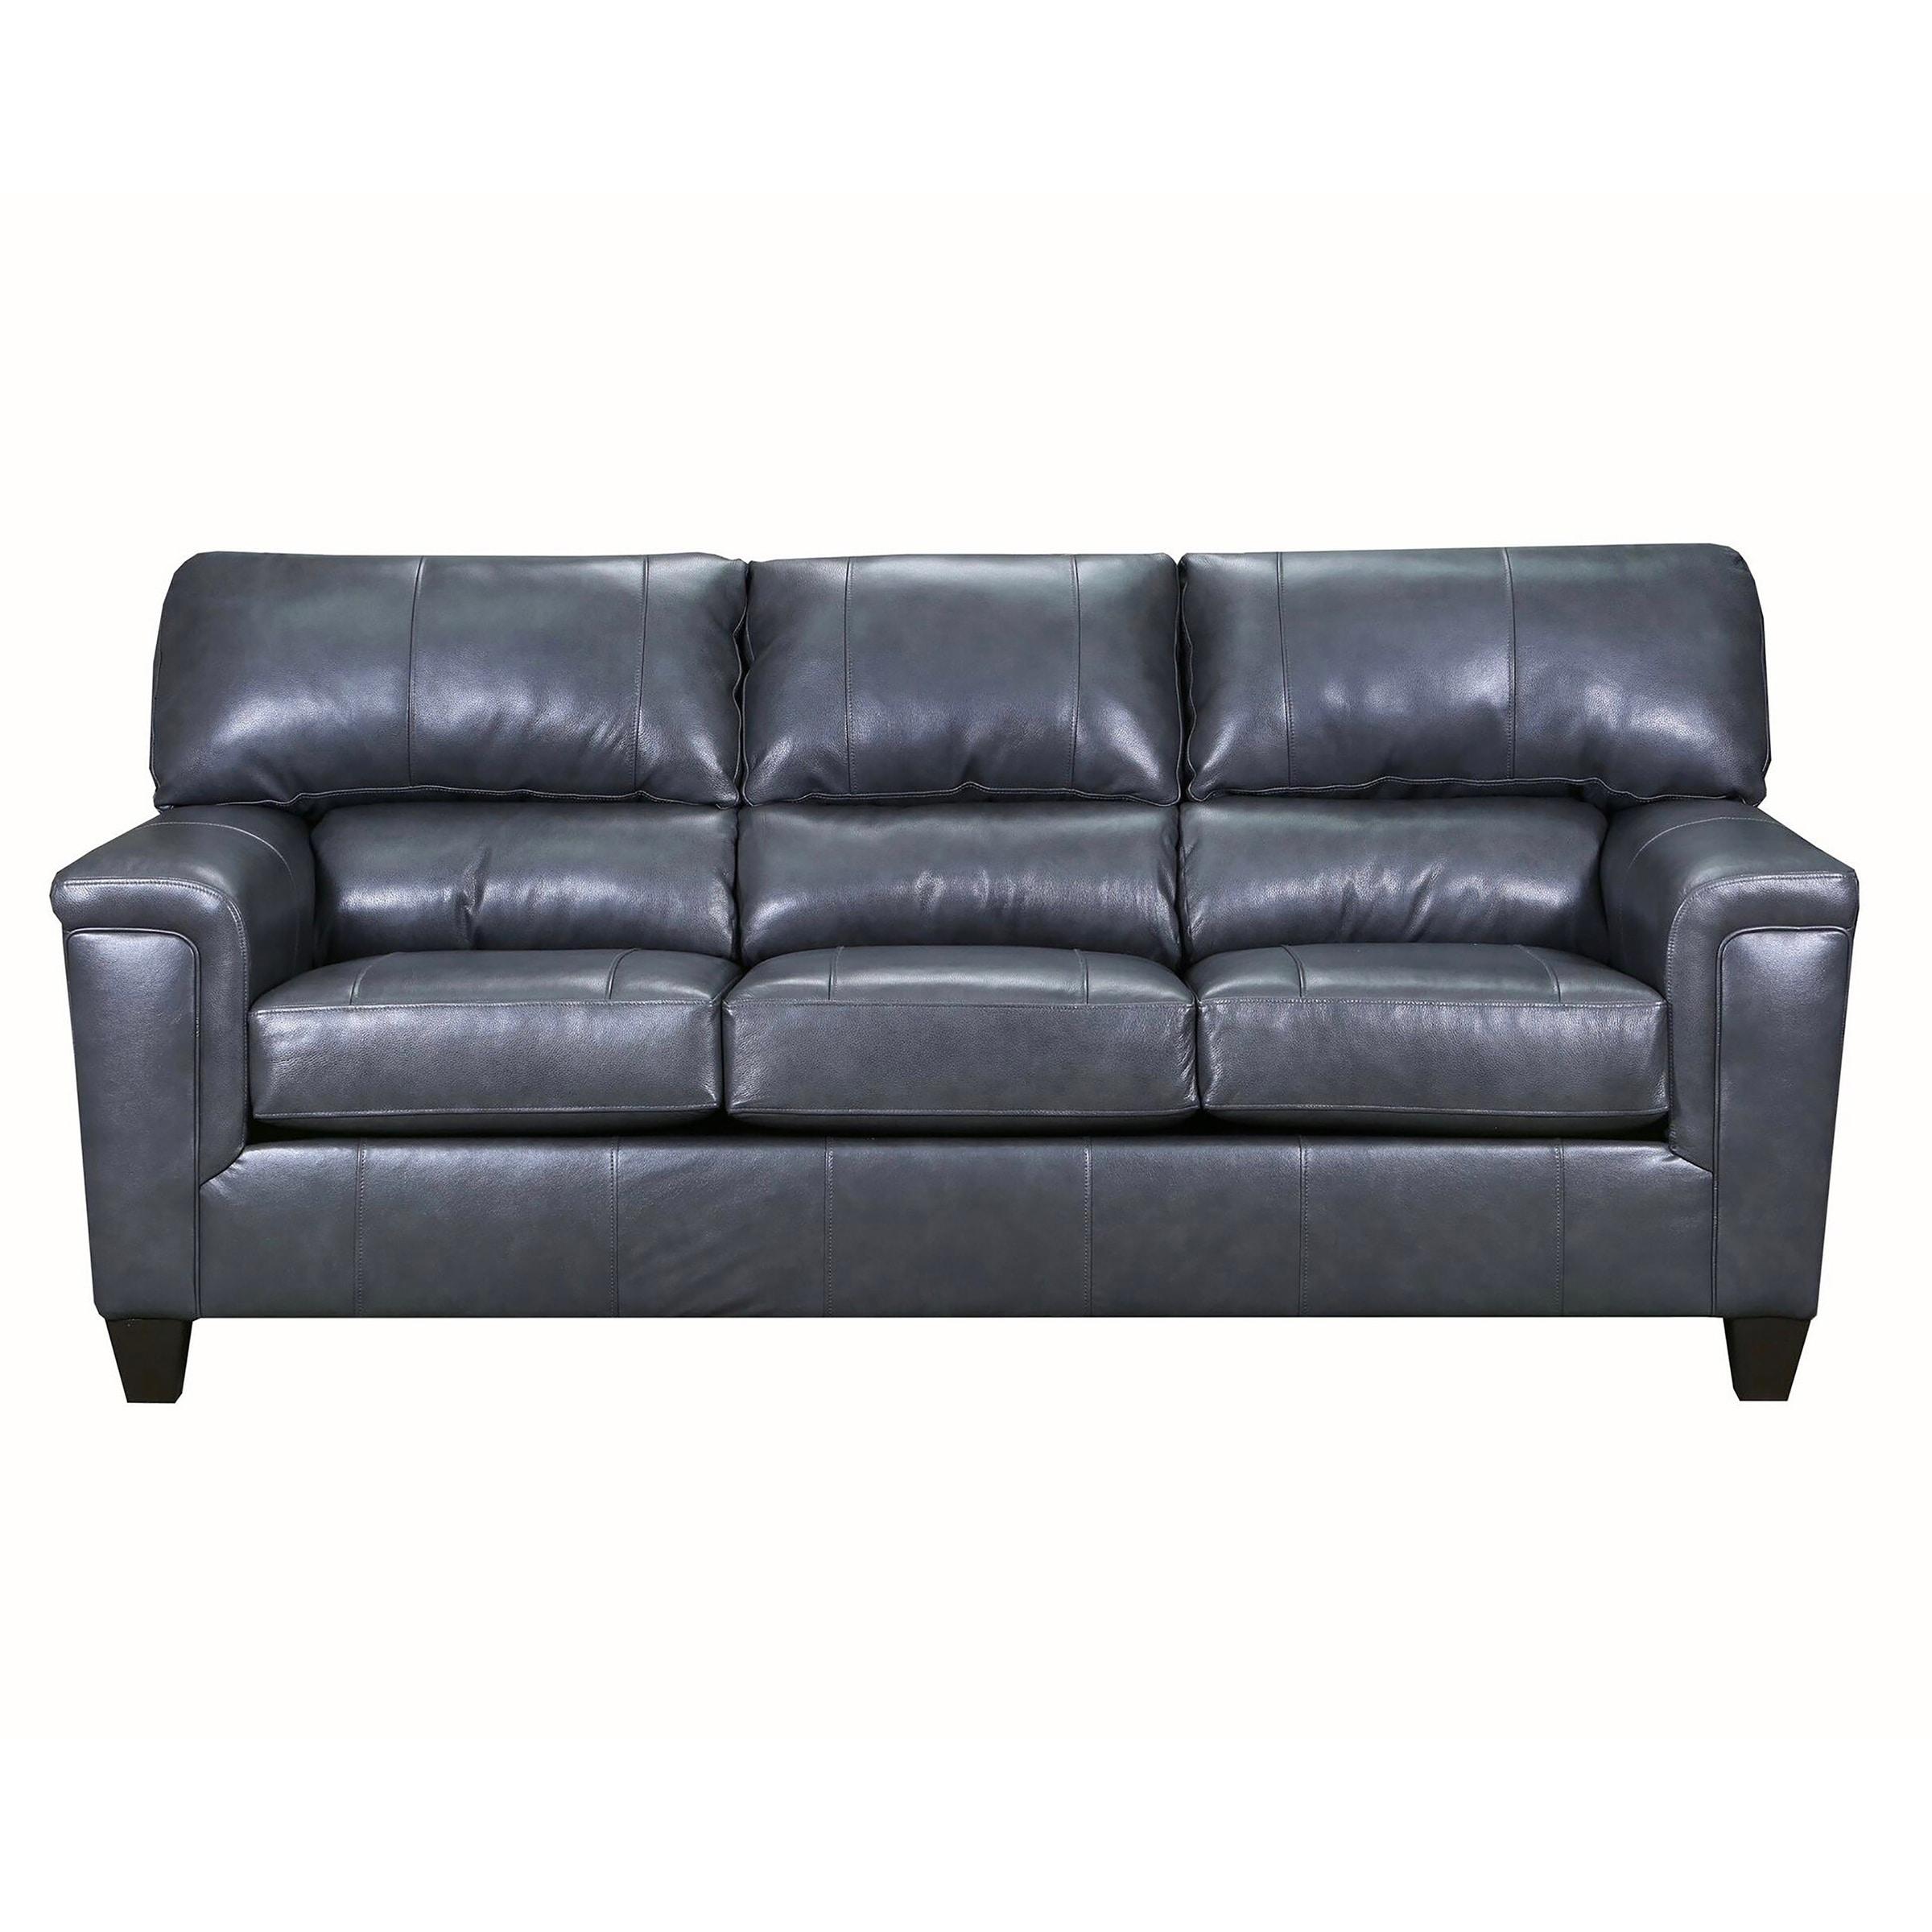 Shop David Top Grain Leather Queen Sleeper Sofa On Sale Free